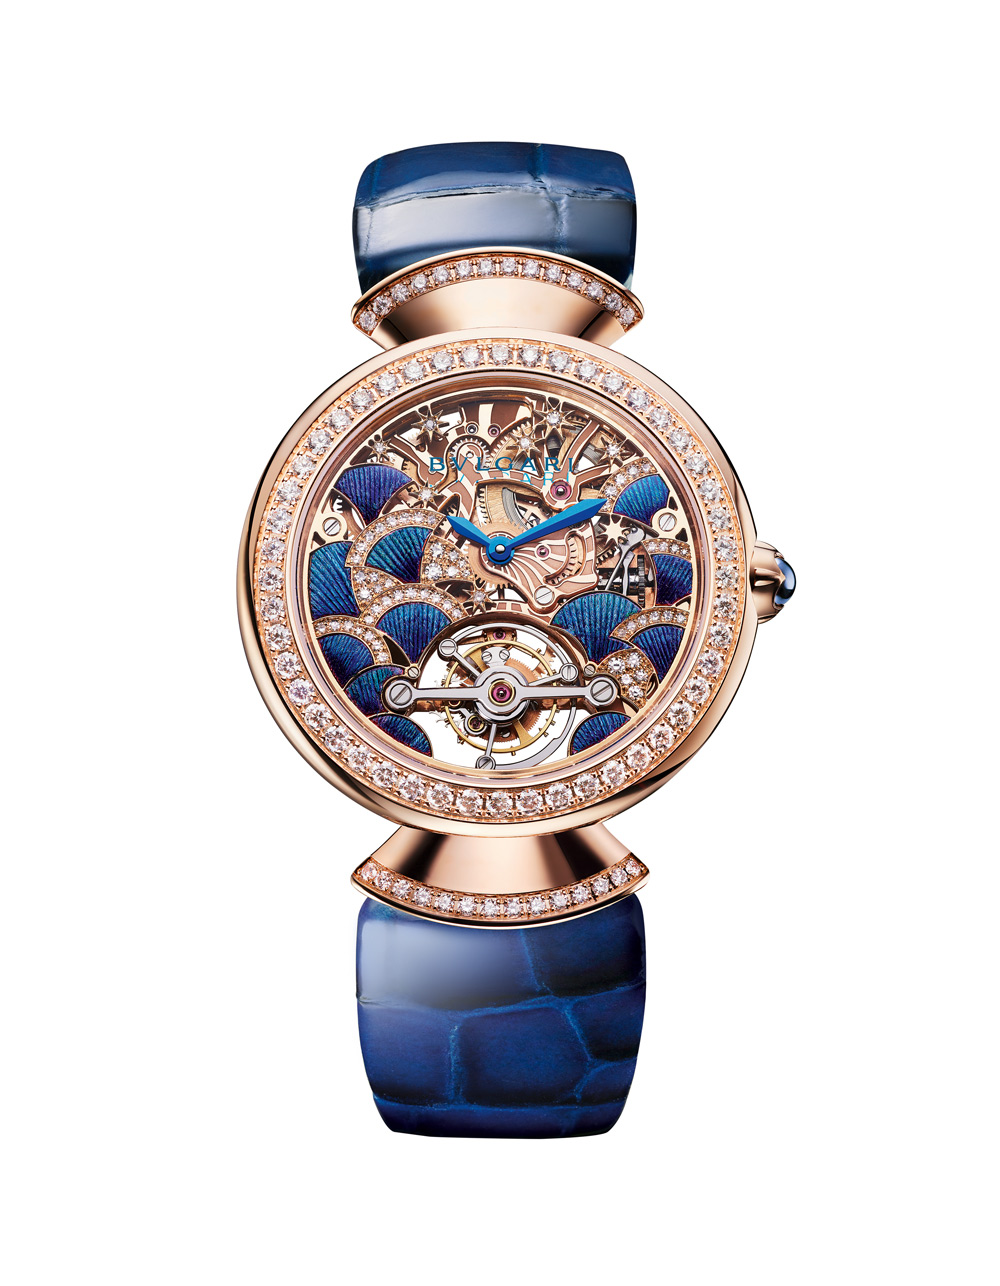 Часы-Diva_s-Dream-Peacock-Tourbillon-Lumiere,-Bulgari